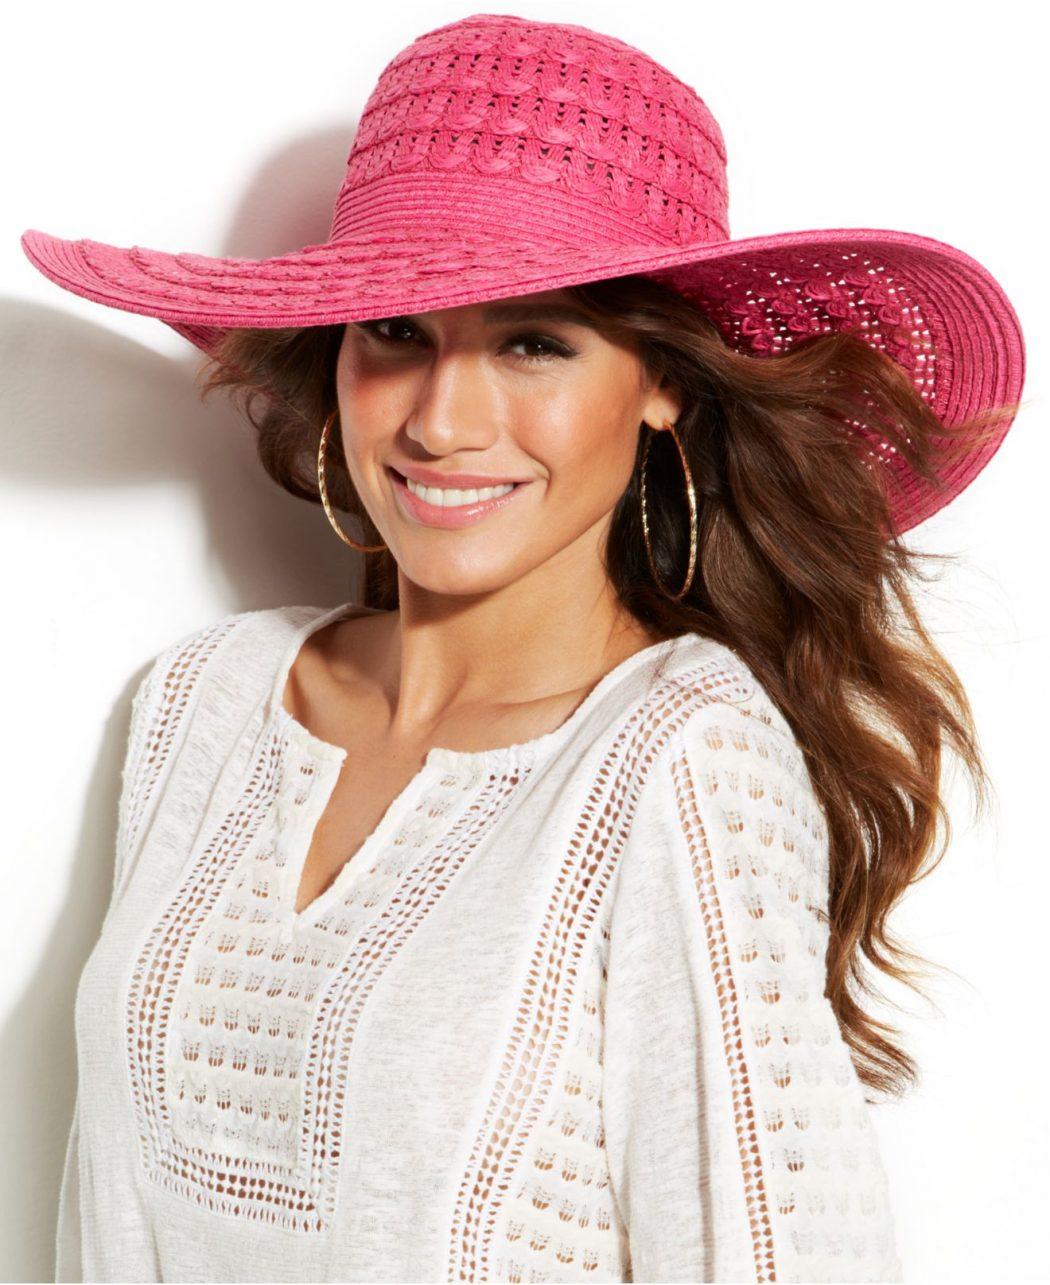 Super-Floppy-Hats1 10 Women's Hat Trends For Summer 2020